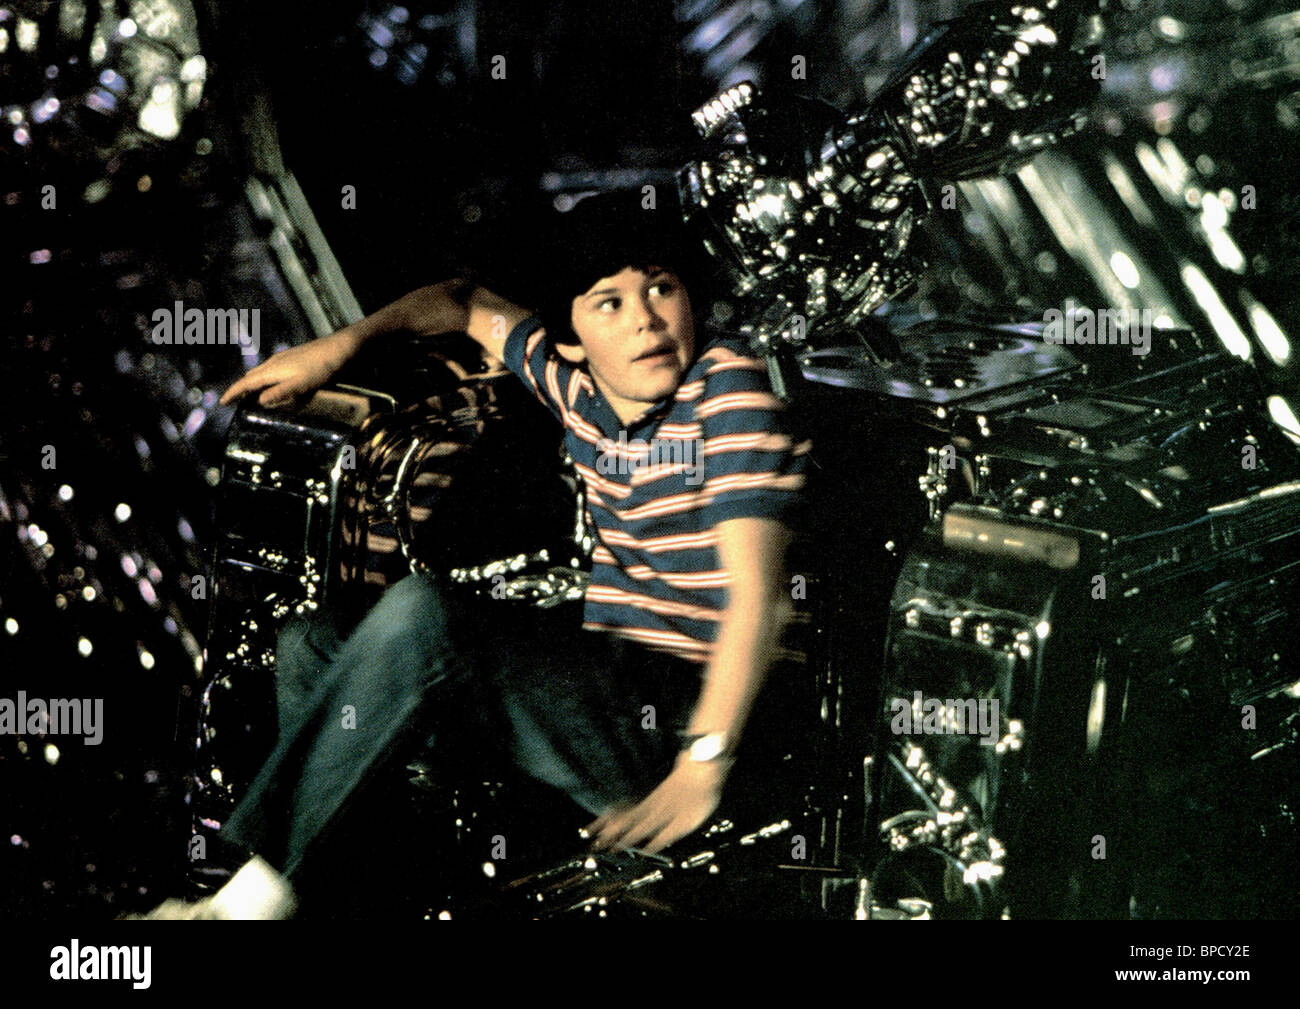 JOEY CRAMER FLIGHT OF THE NAVIGATOR (1986) - Stock Image